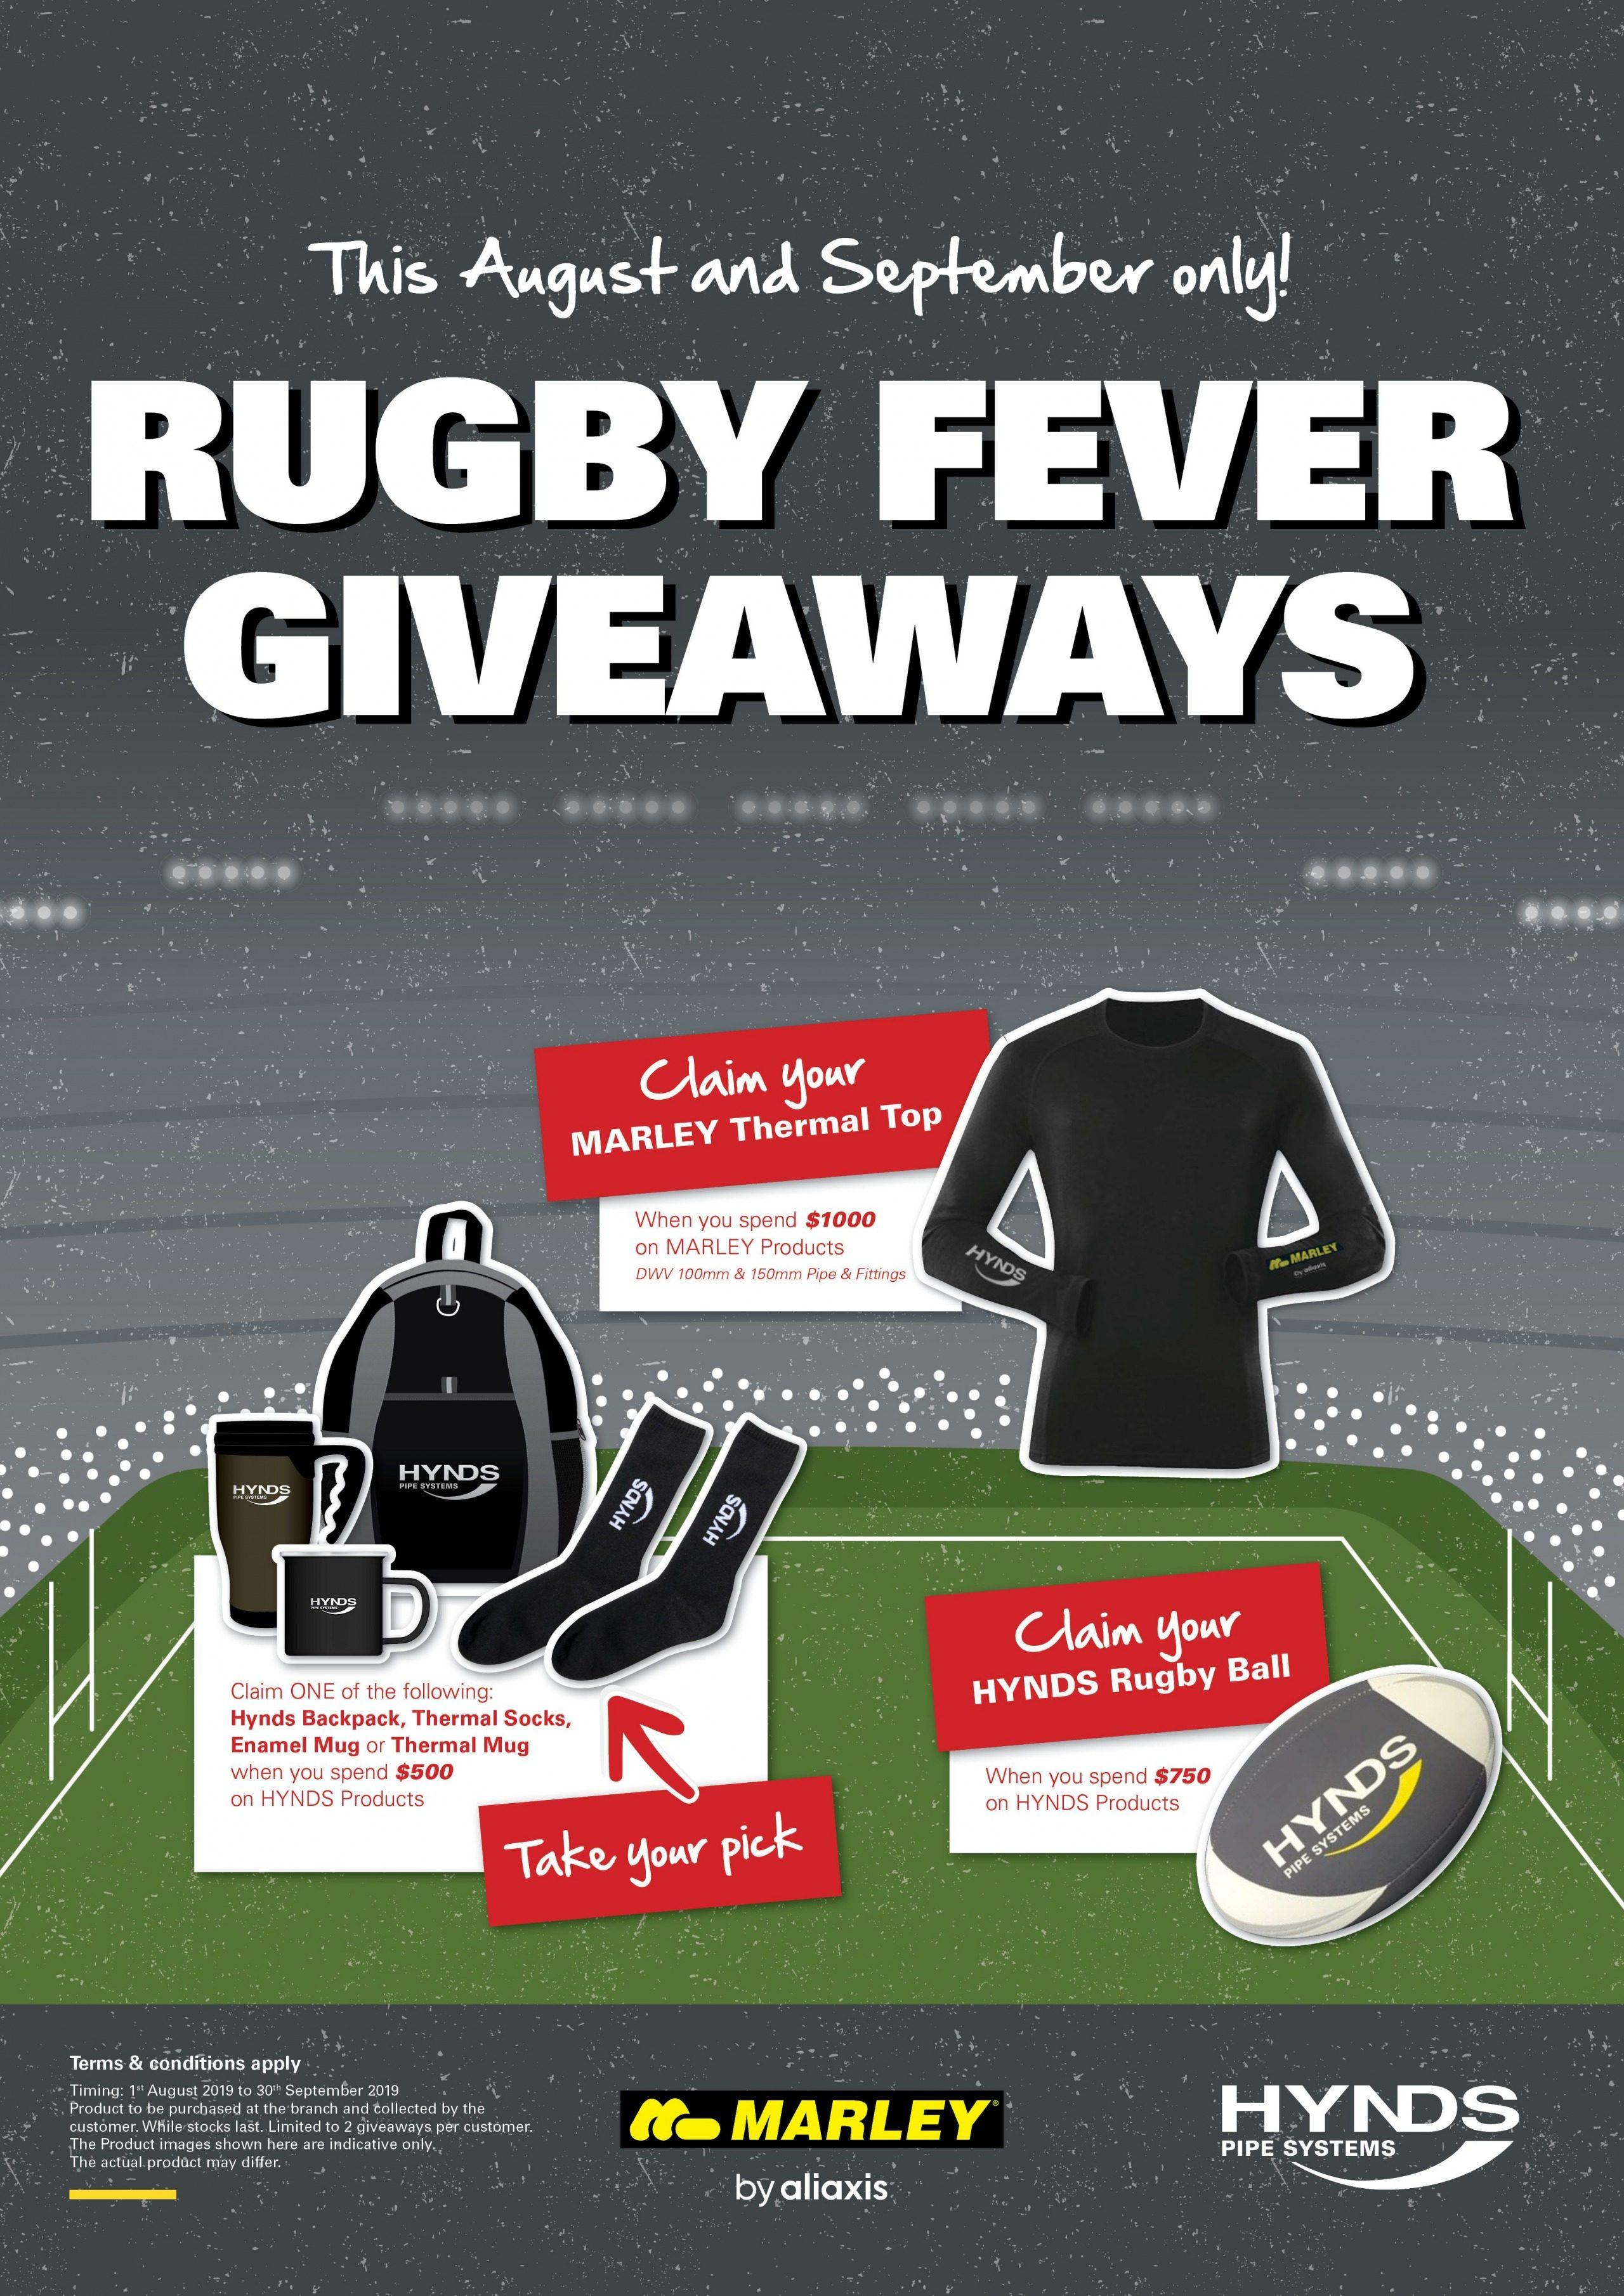 Marley Rugby Fever Giveaways